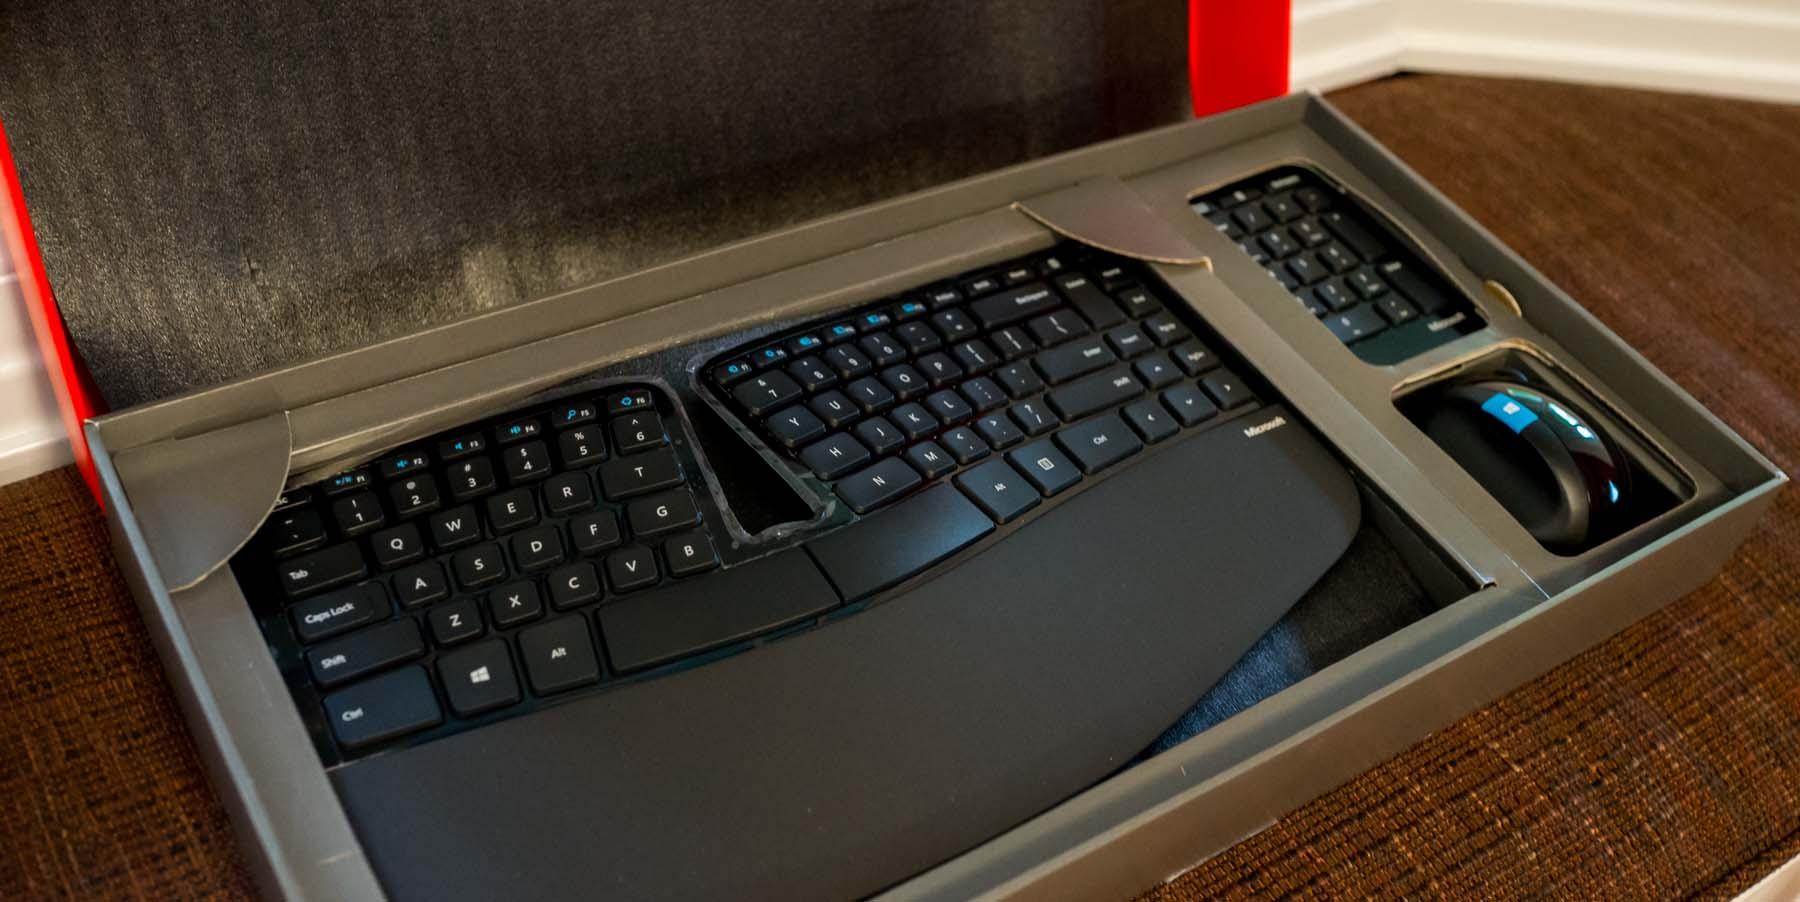 microsoft ergonomic keyboard 4000 instructions